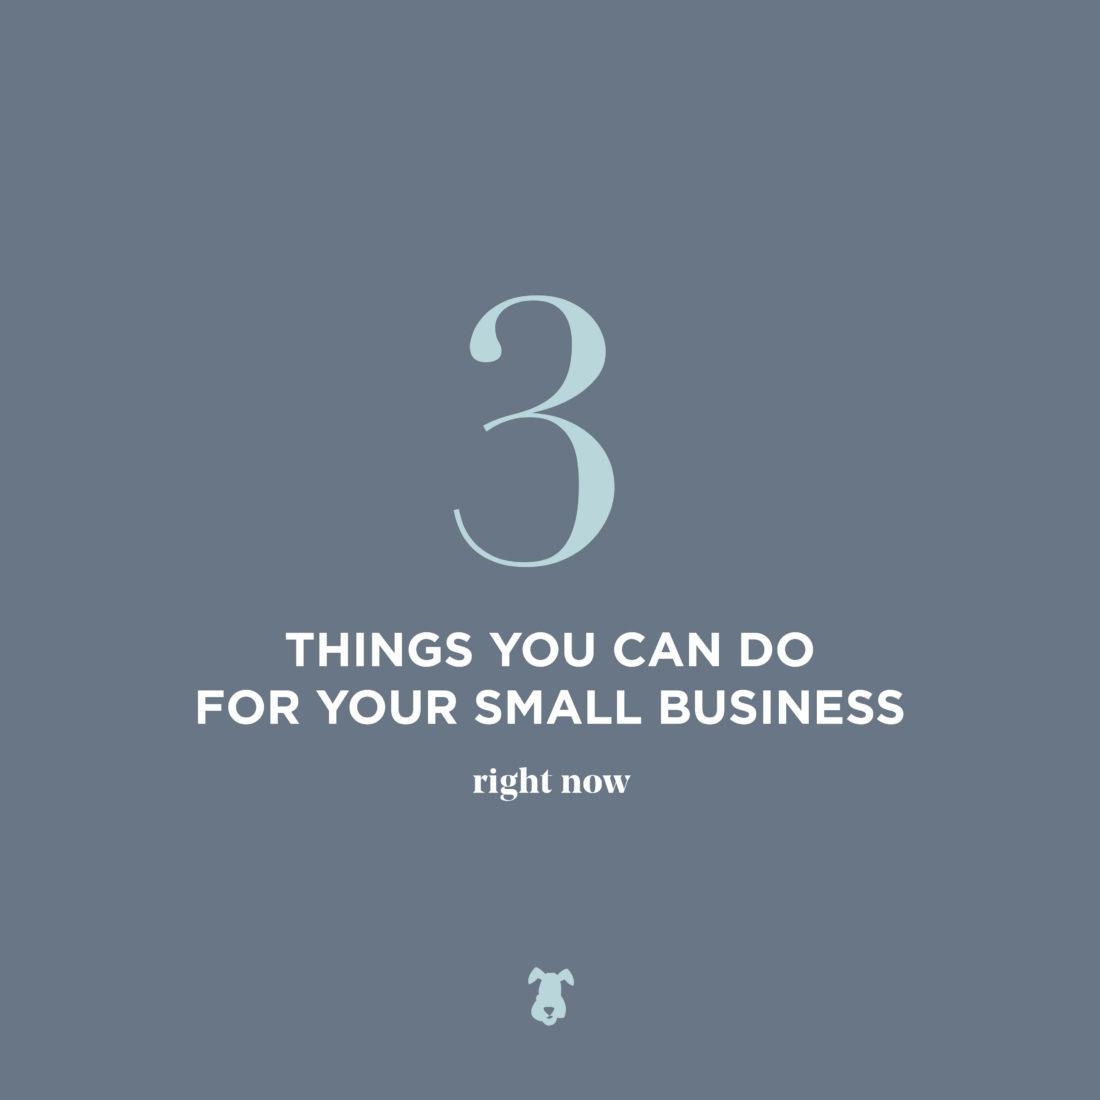 small-business-help-corona-virus